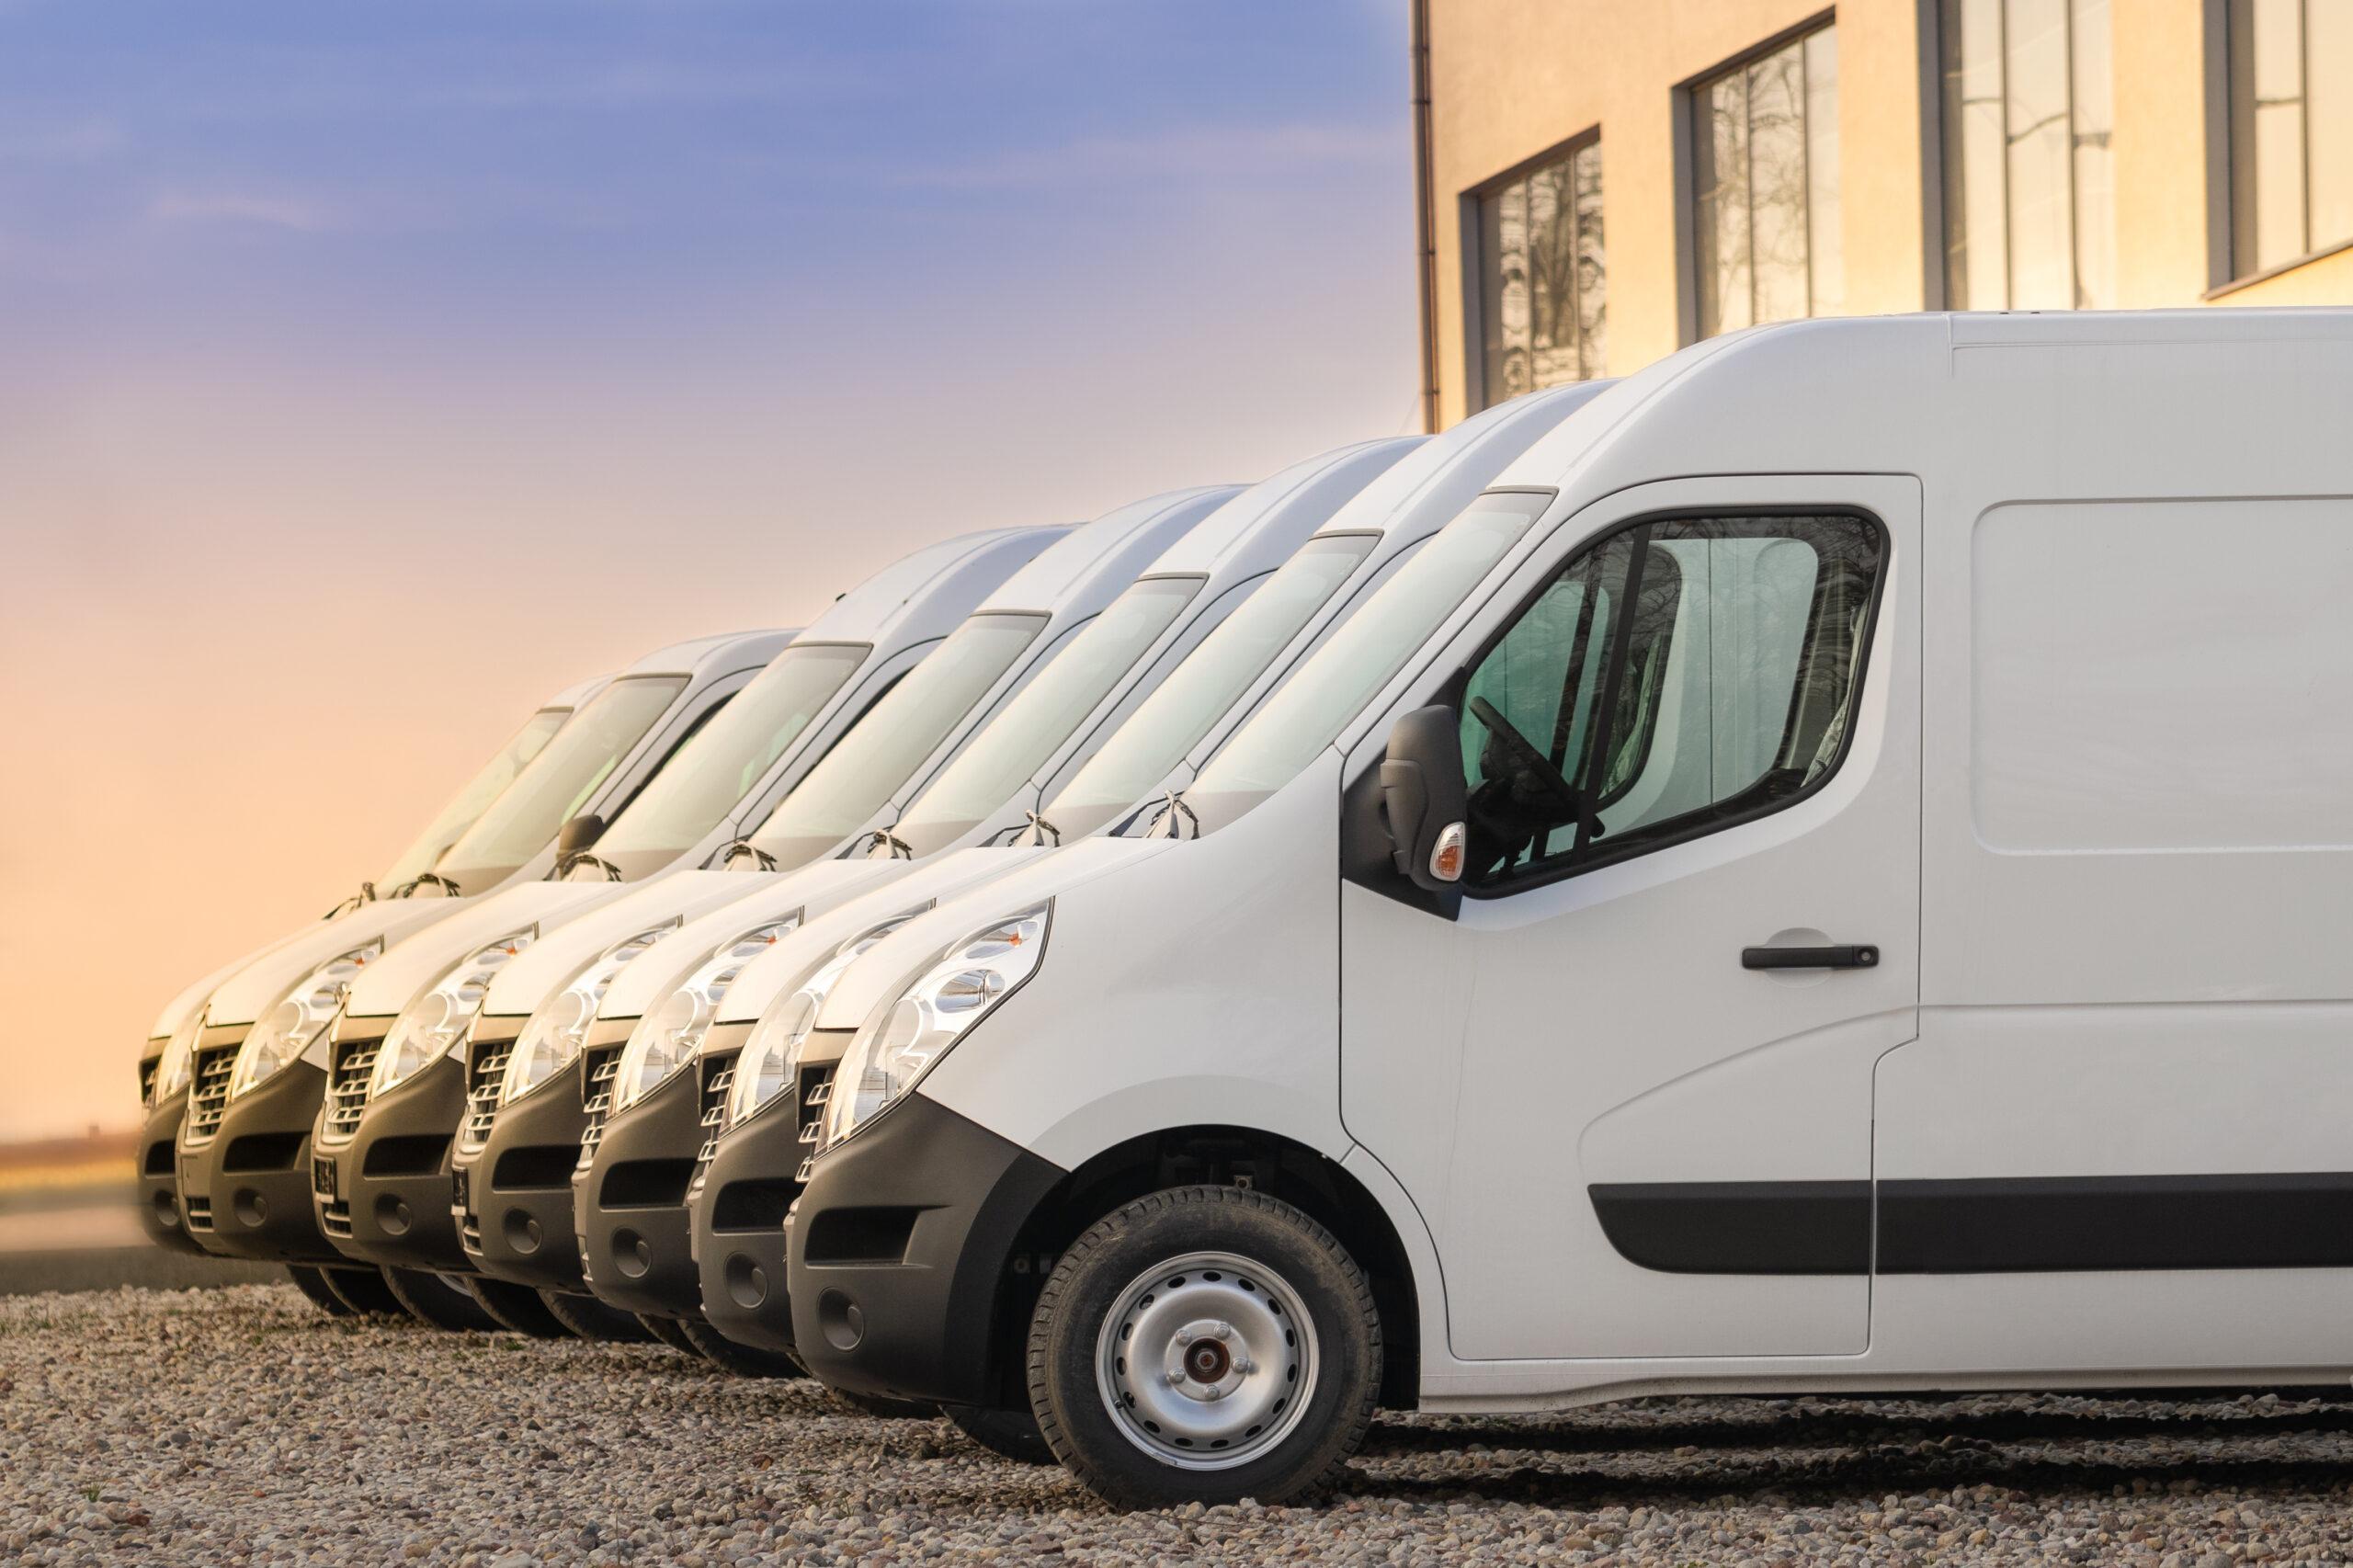 AI-based insurance for fleet vehicles